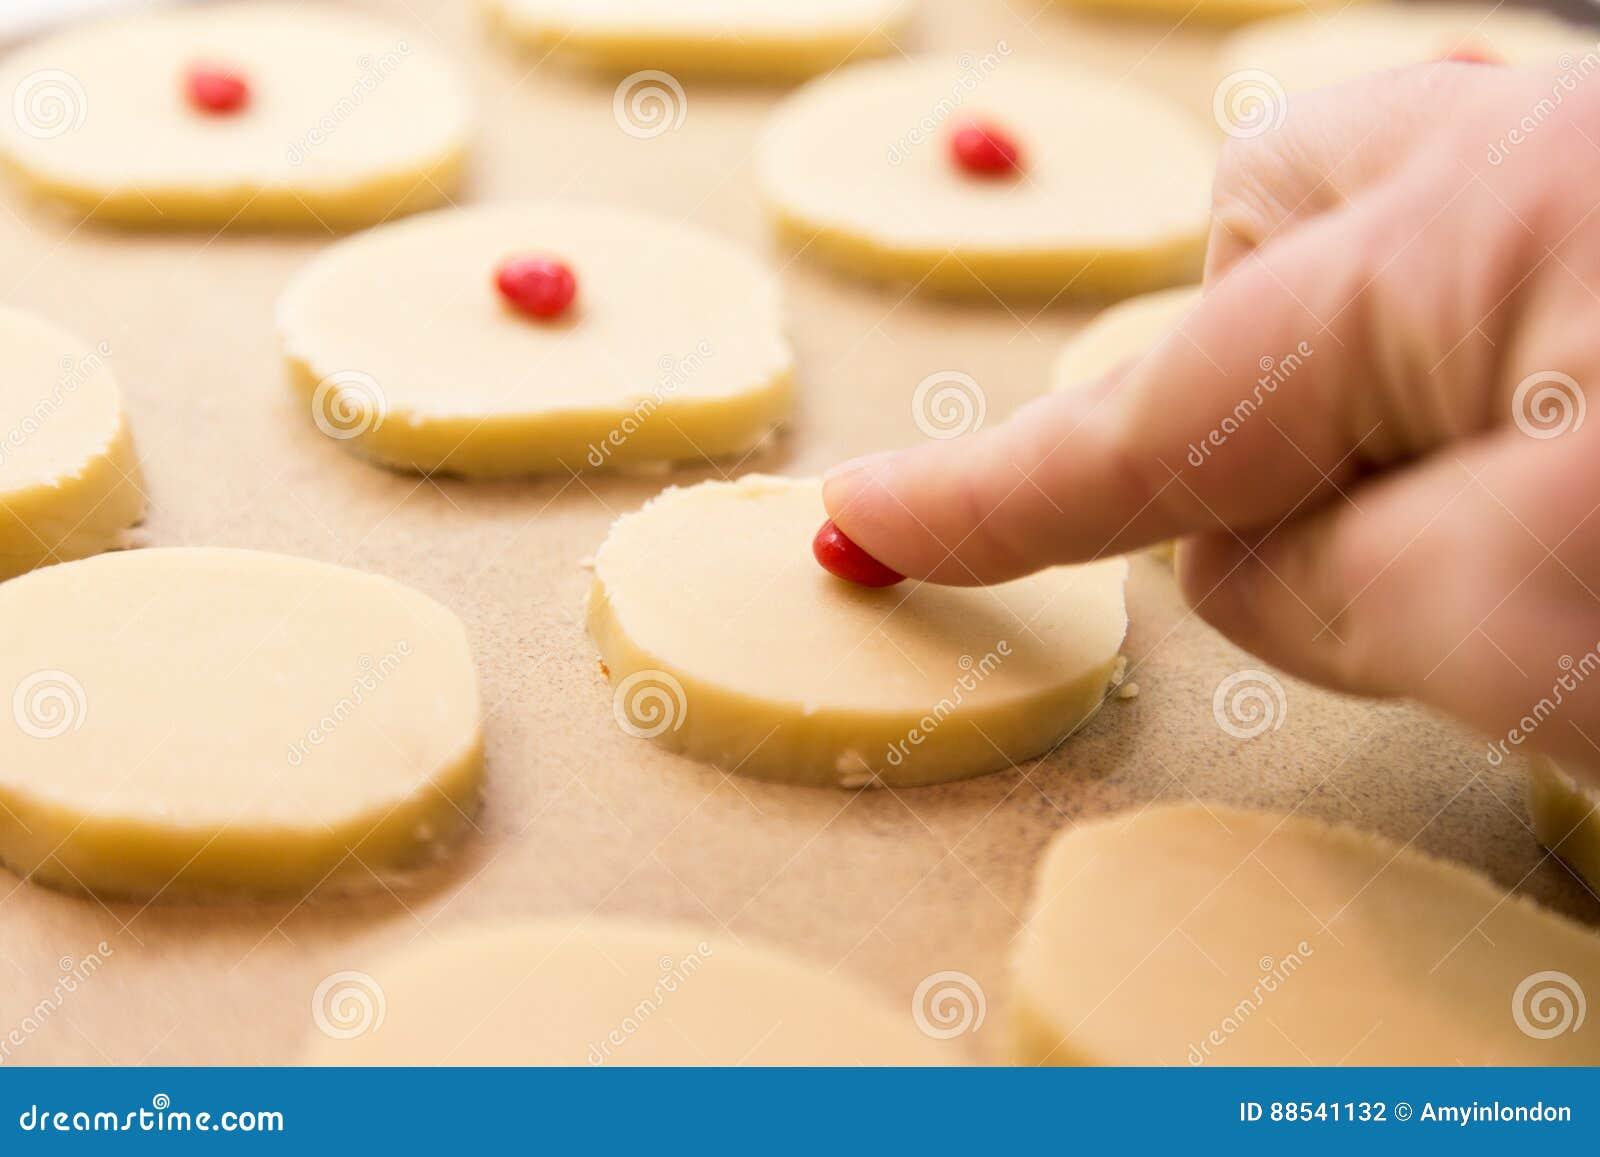 Christmas Shortbread Cookies.Baking Christmas Shortbread Cookies Stock Photo Image Of Sweets